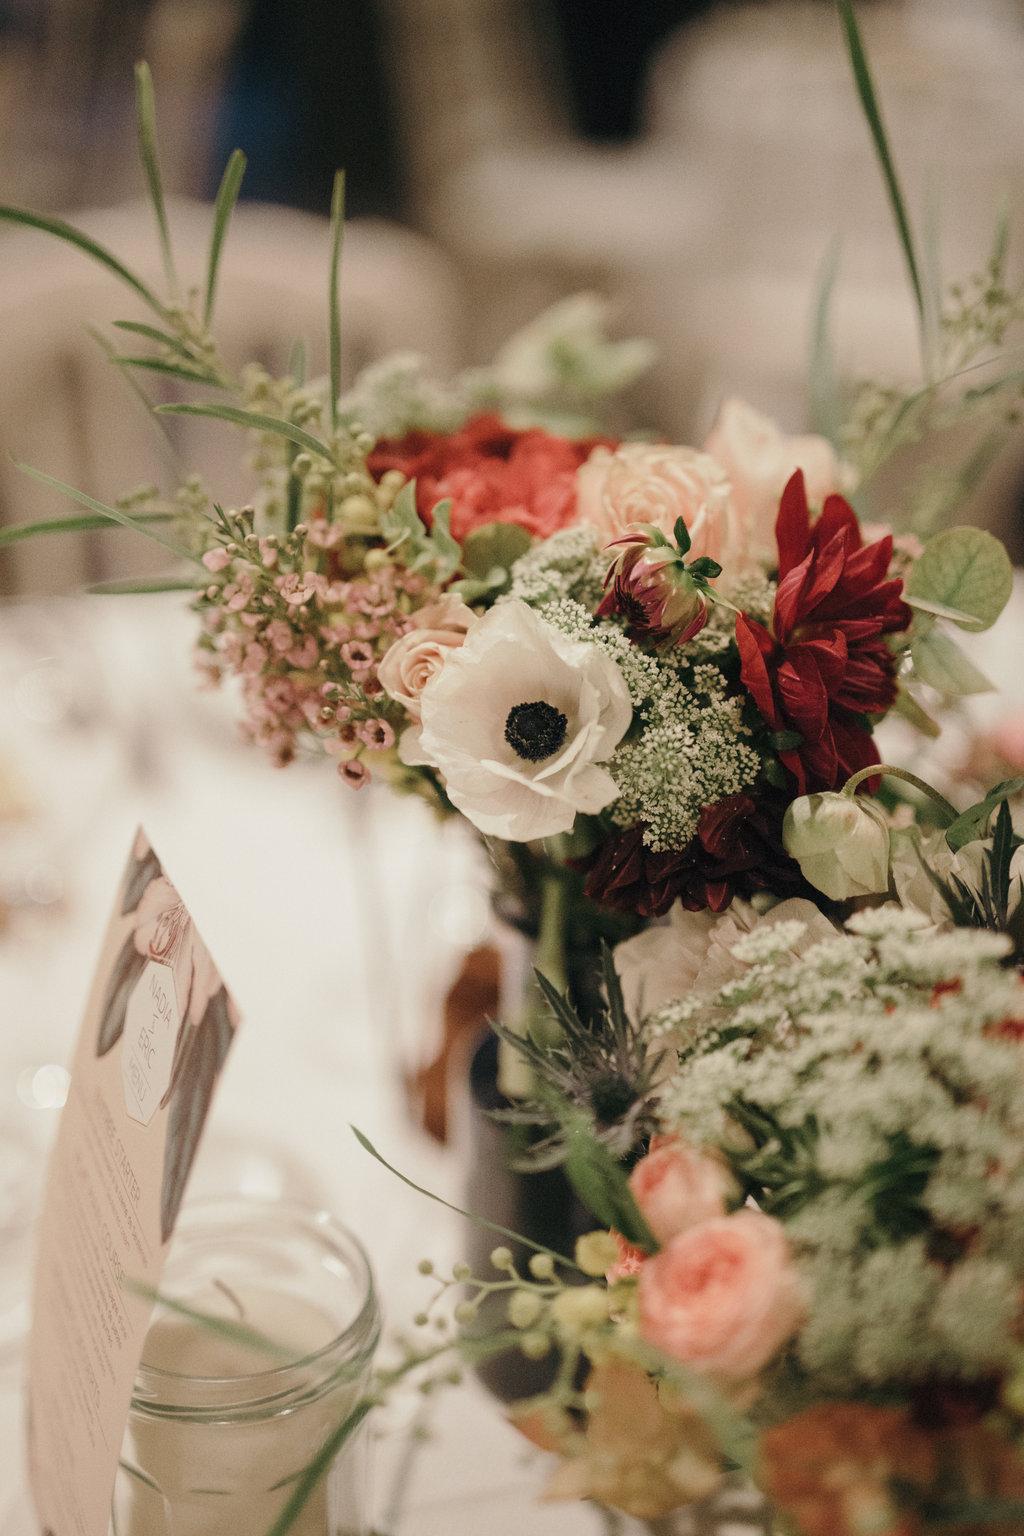 sebastienboudot-wedding-photographer-nadia-eric-437